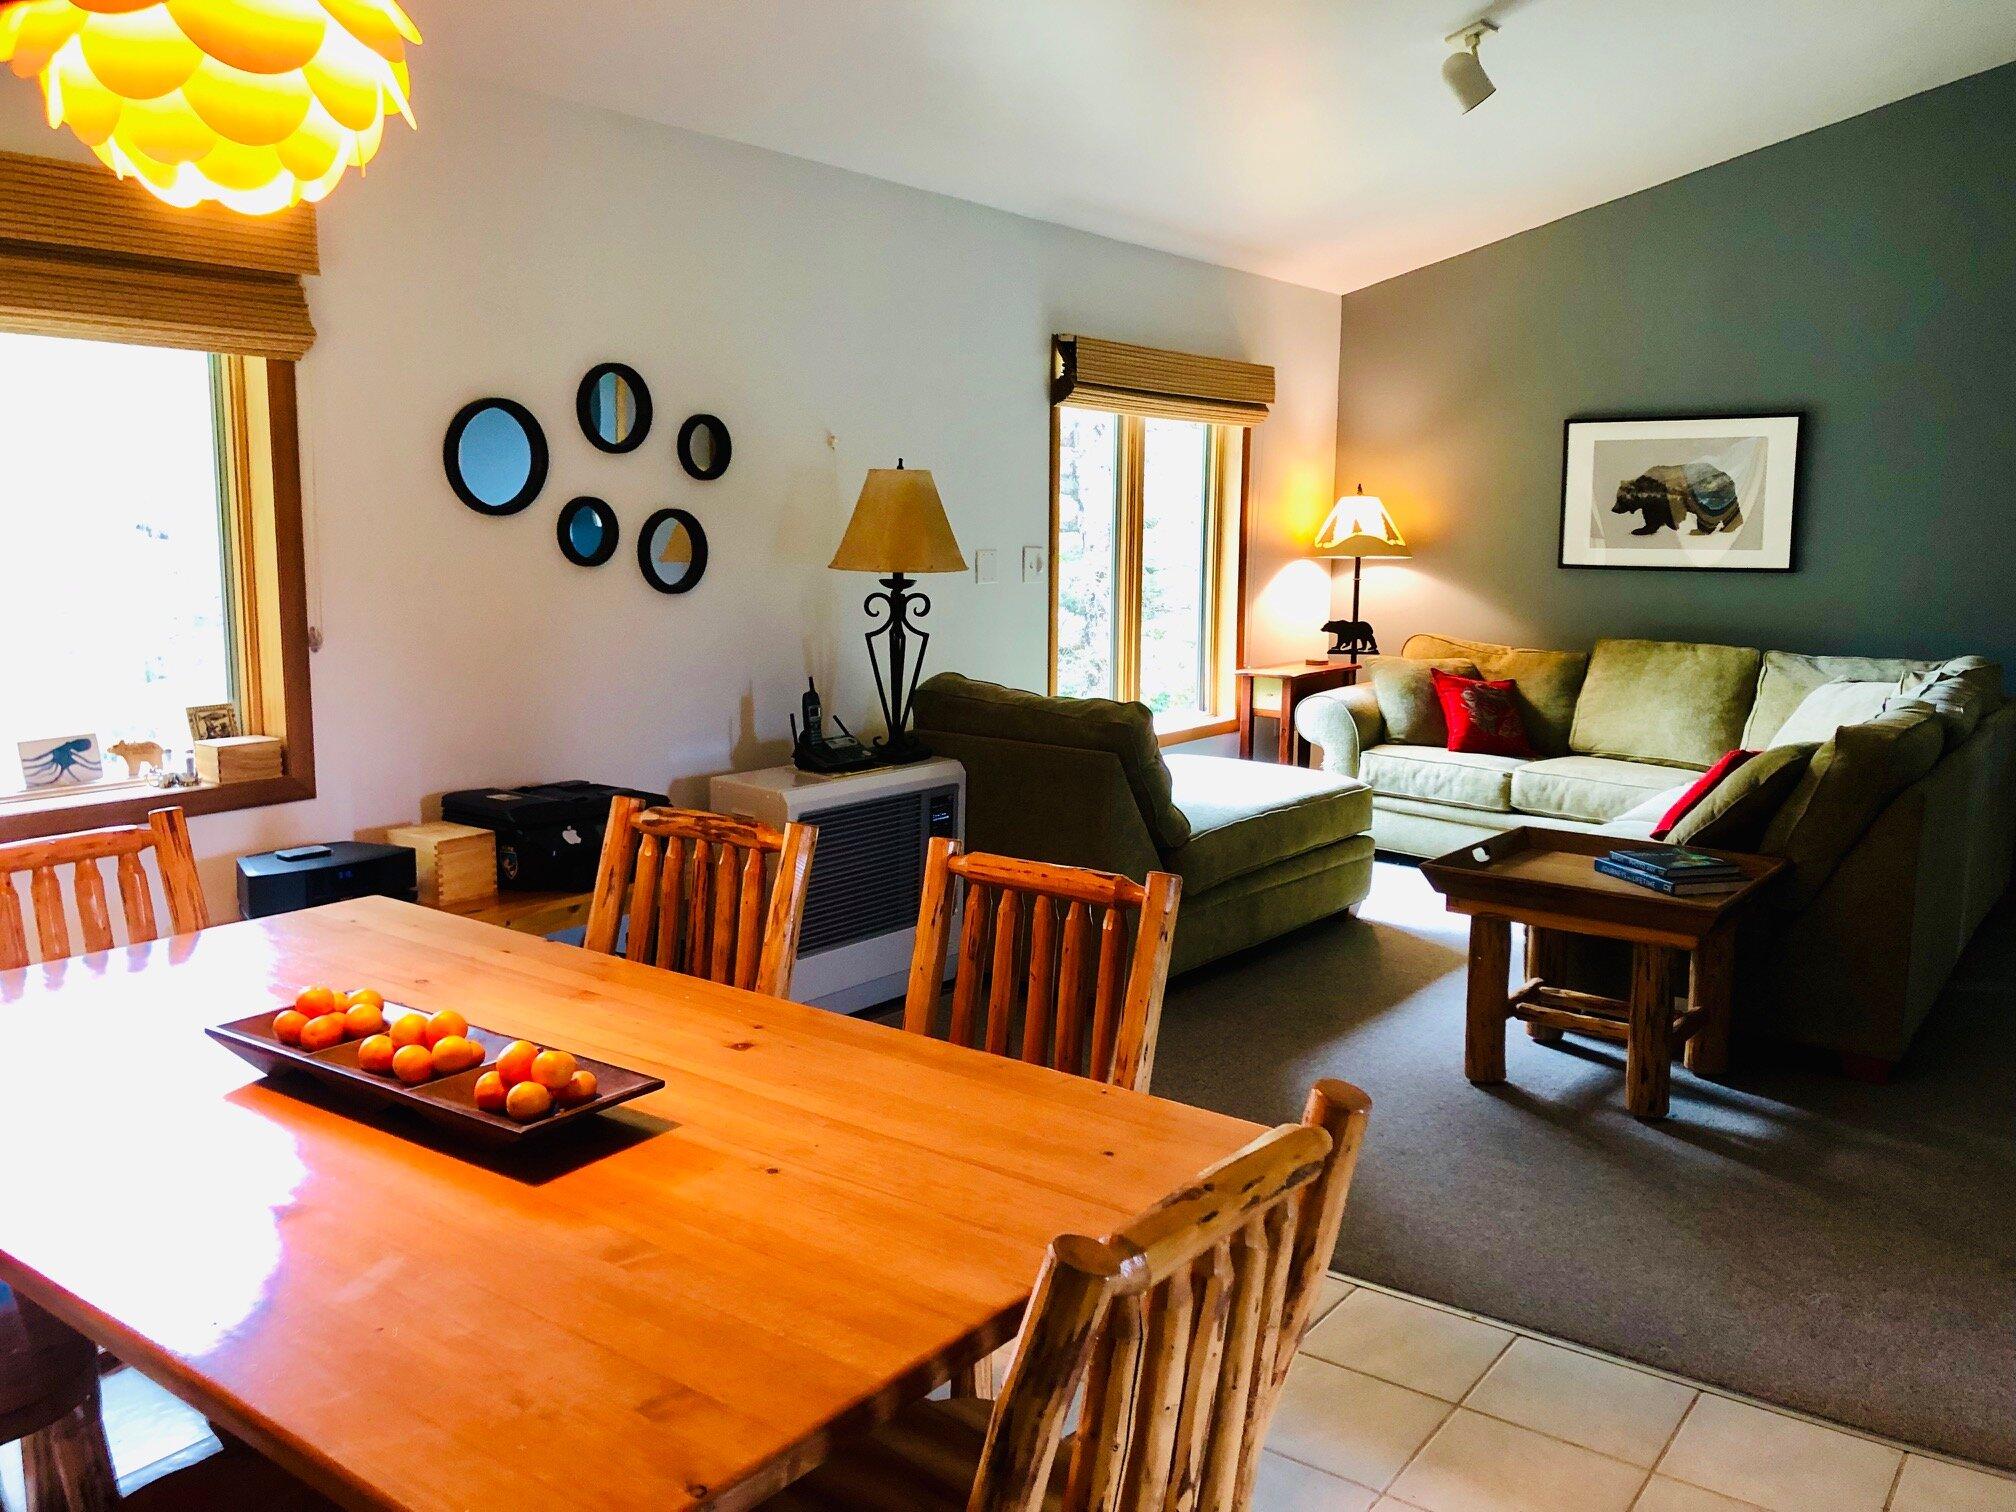 interior kitchen to living room.jpg